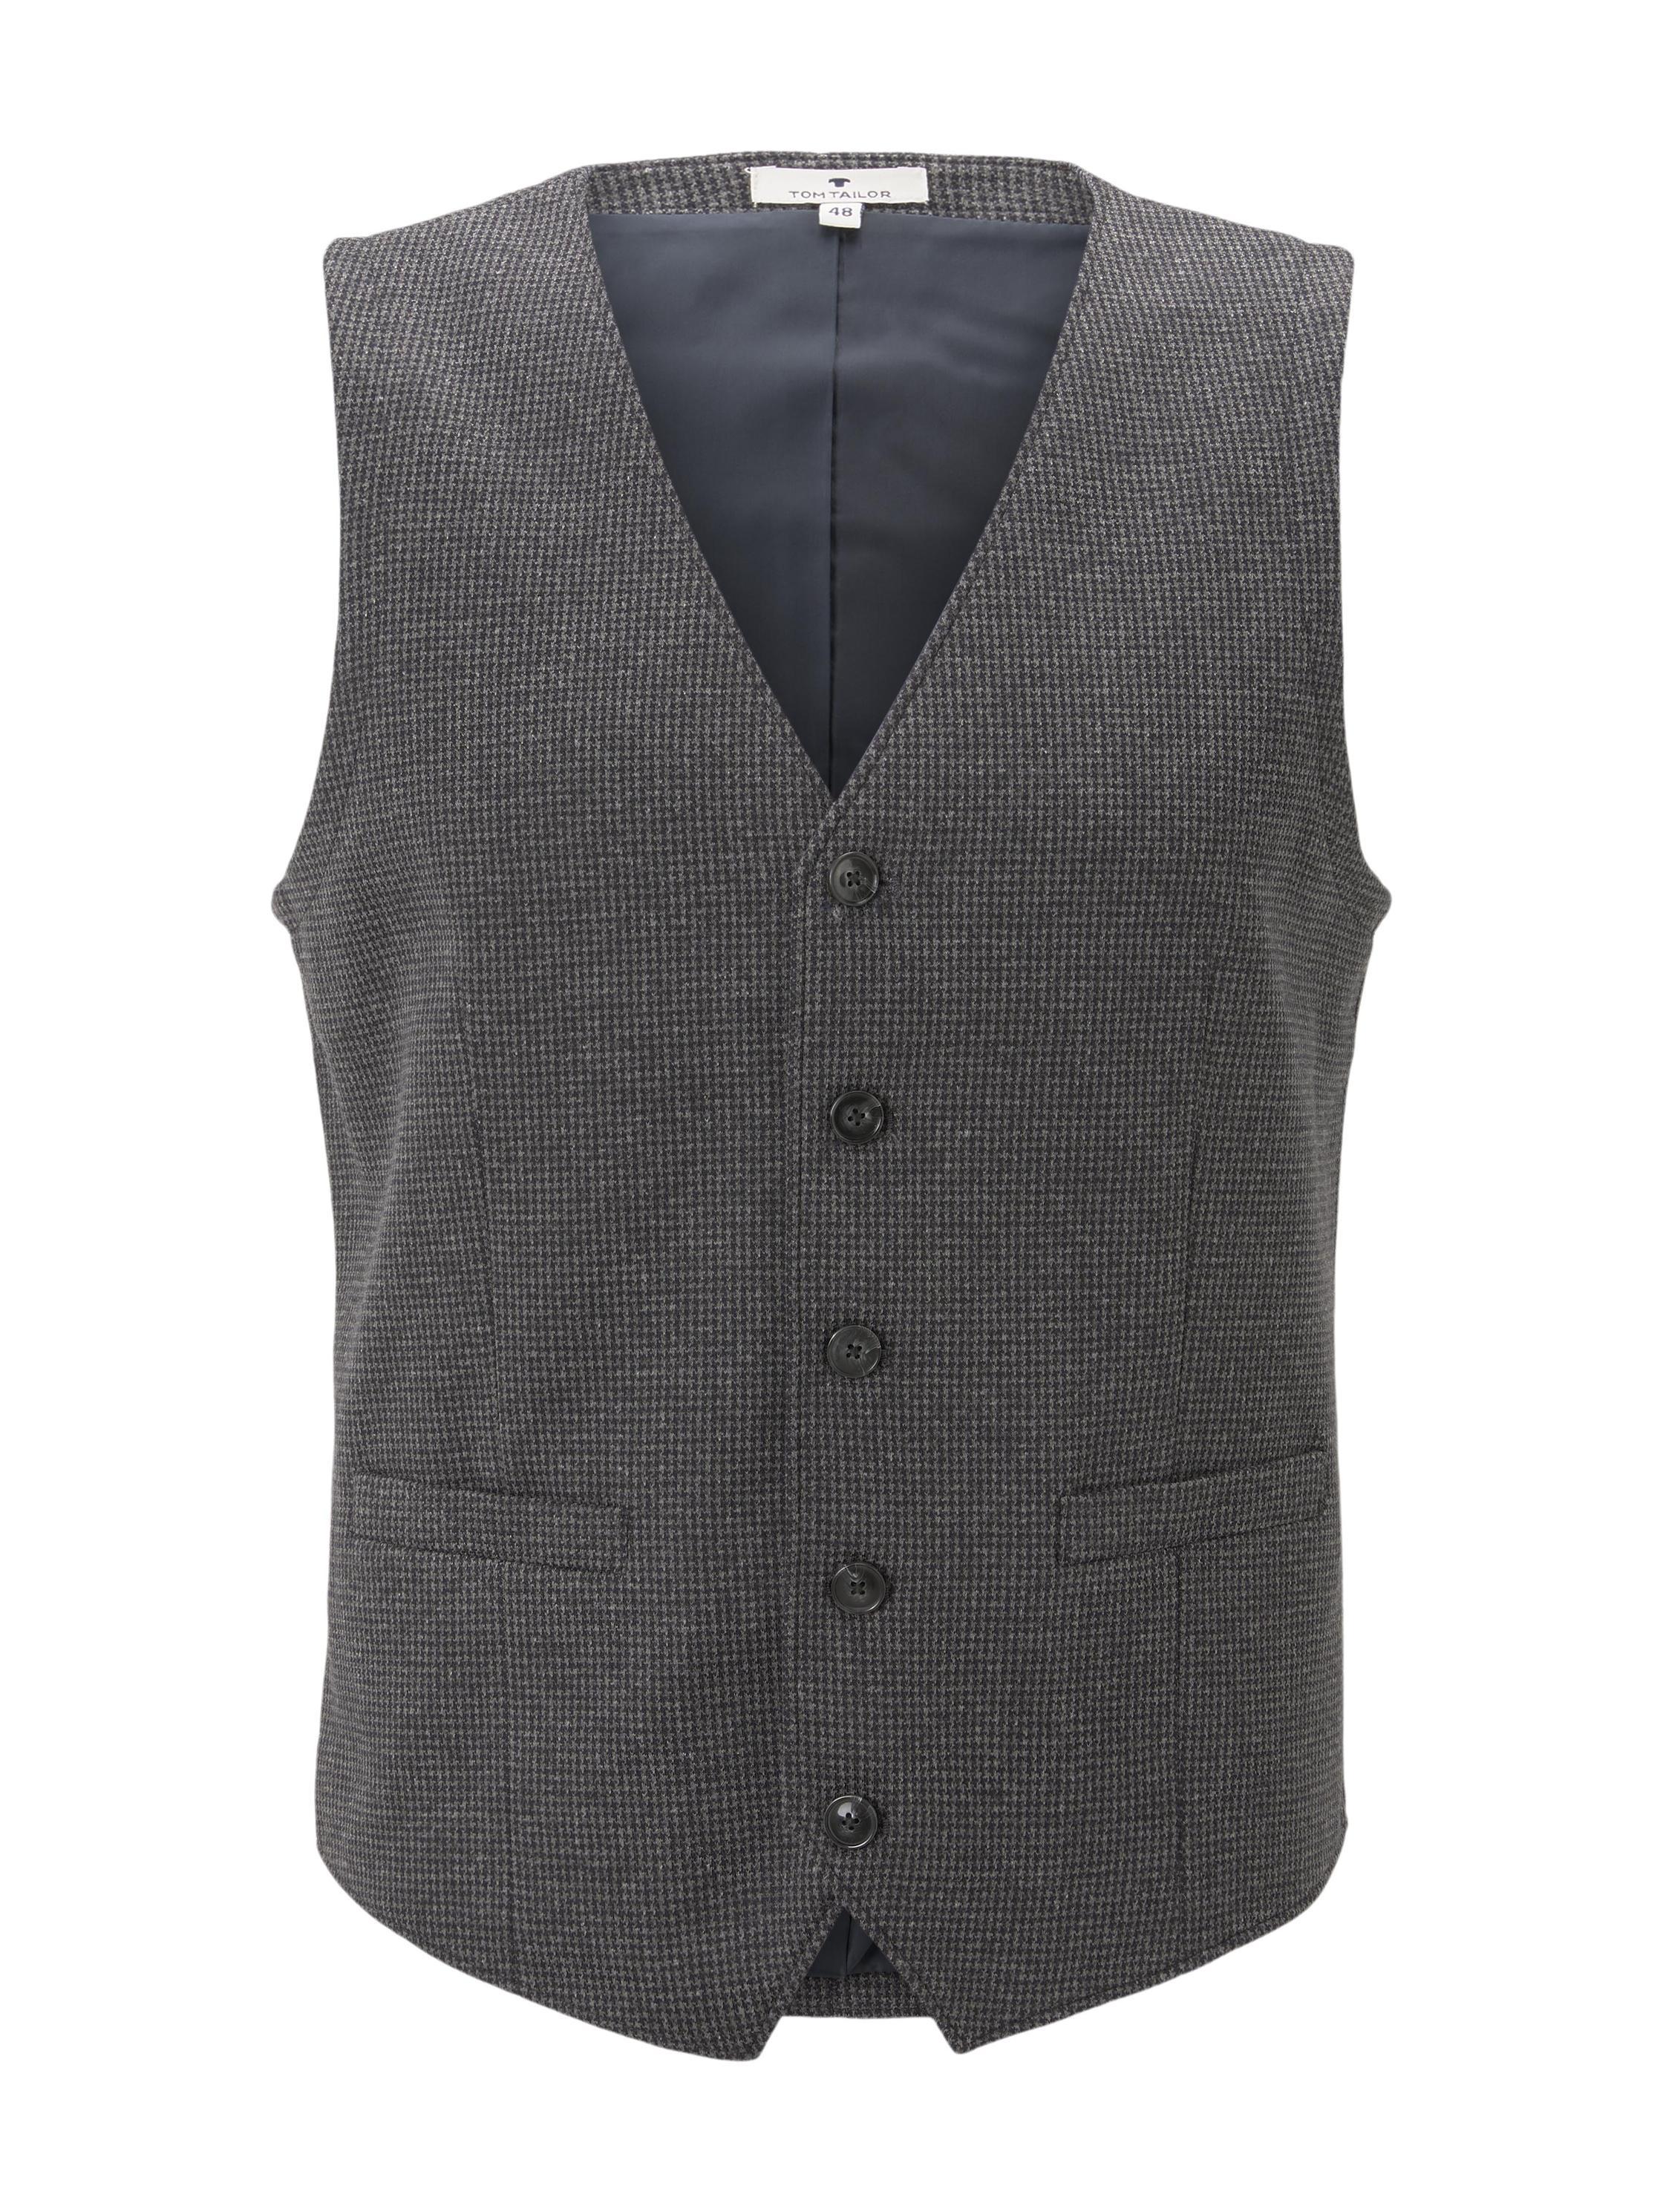 houndstooth jersey vest, navy houndstooth